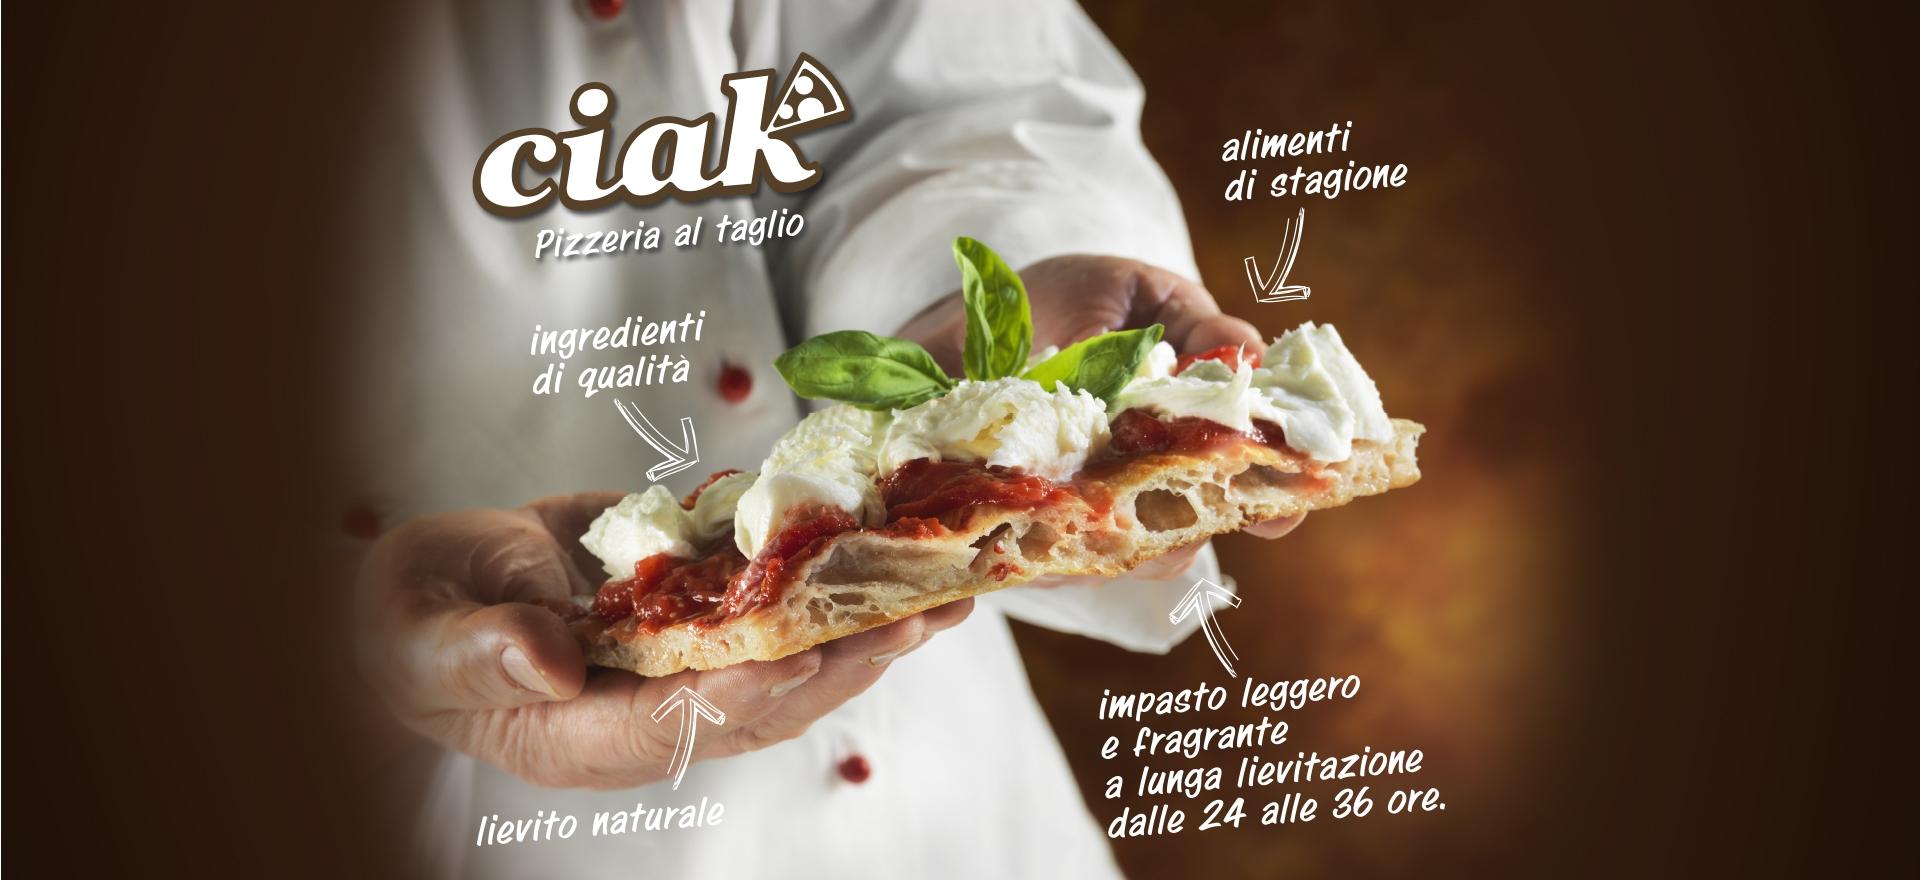 Pizzeria Ciak